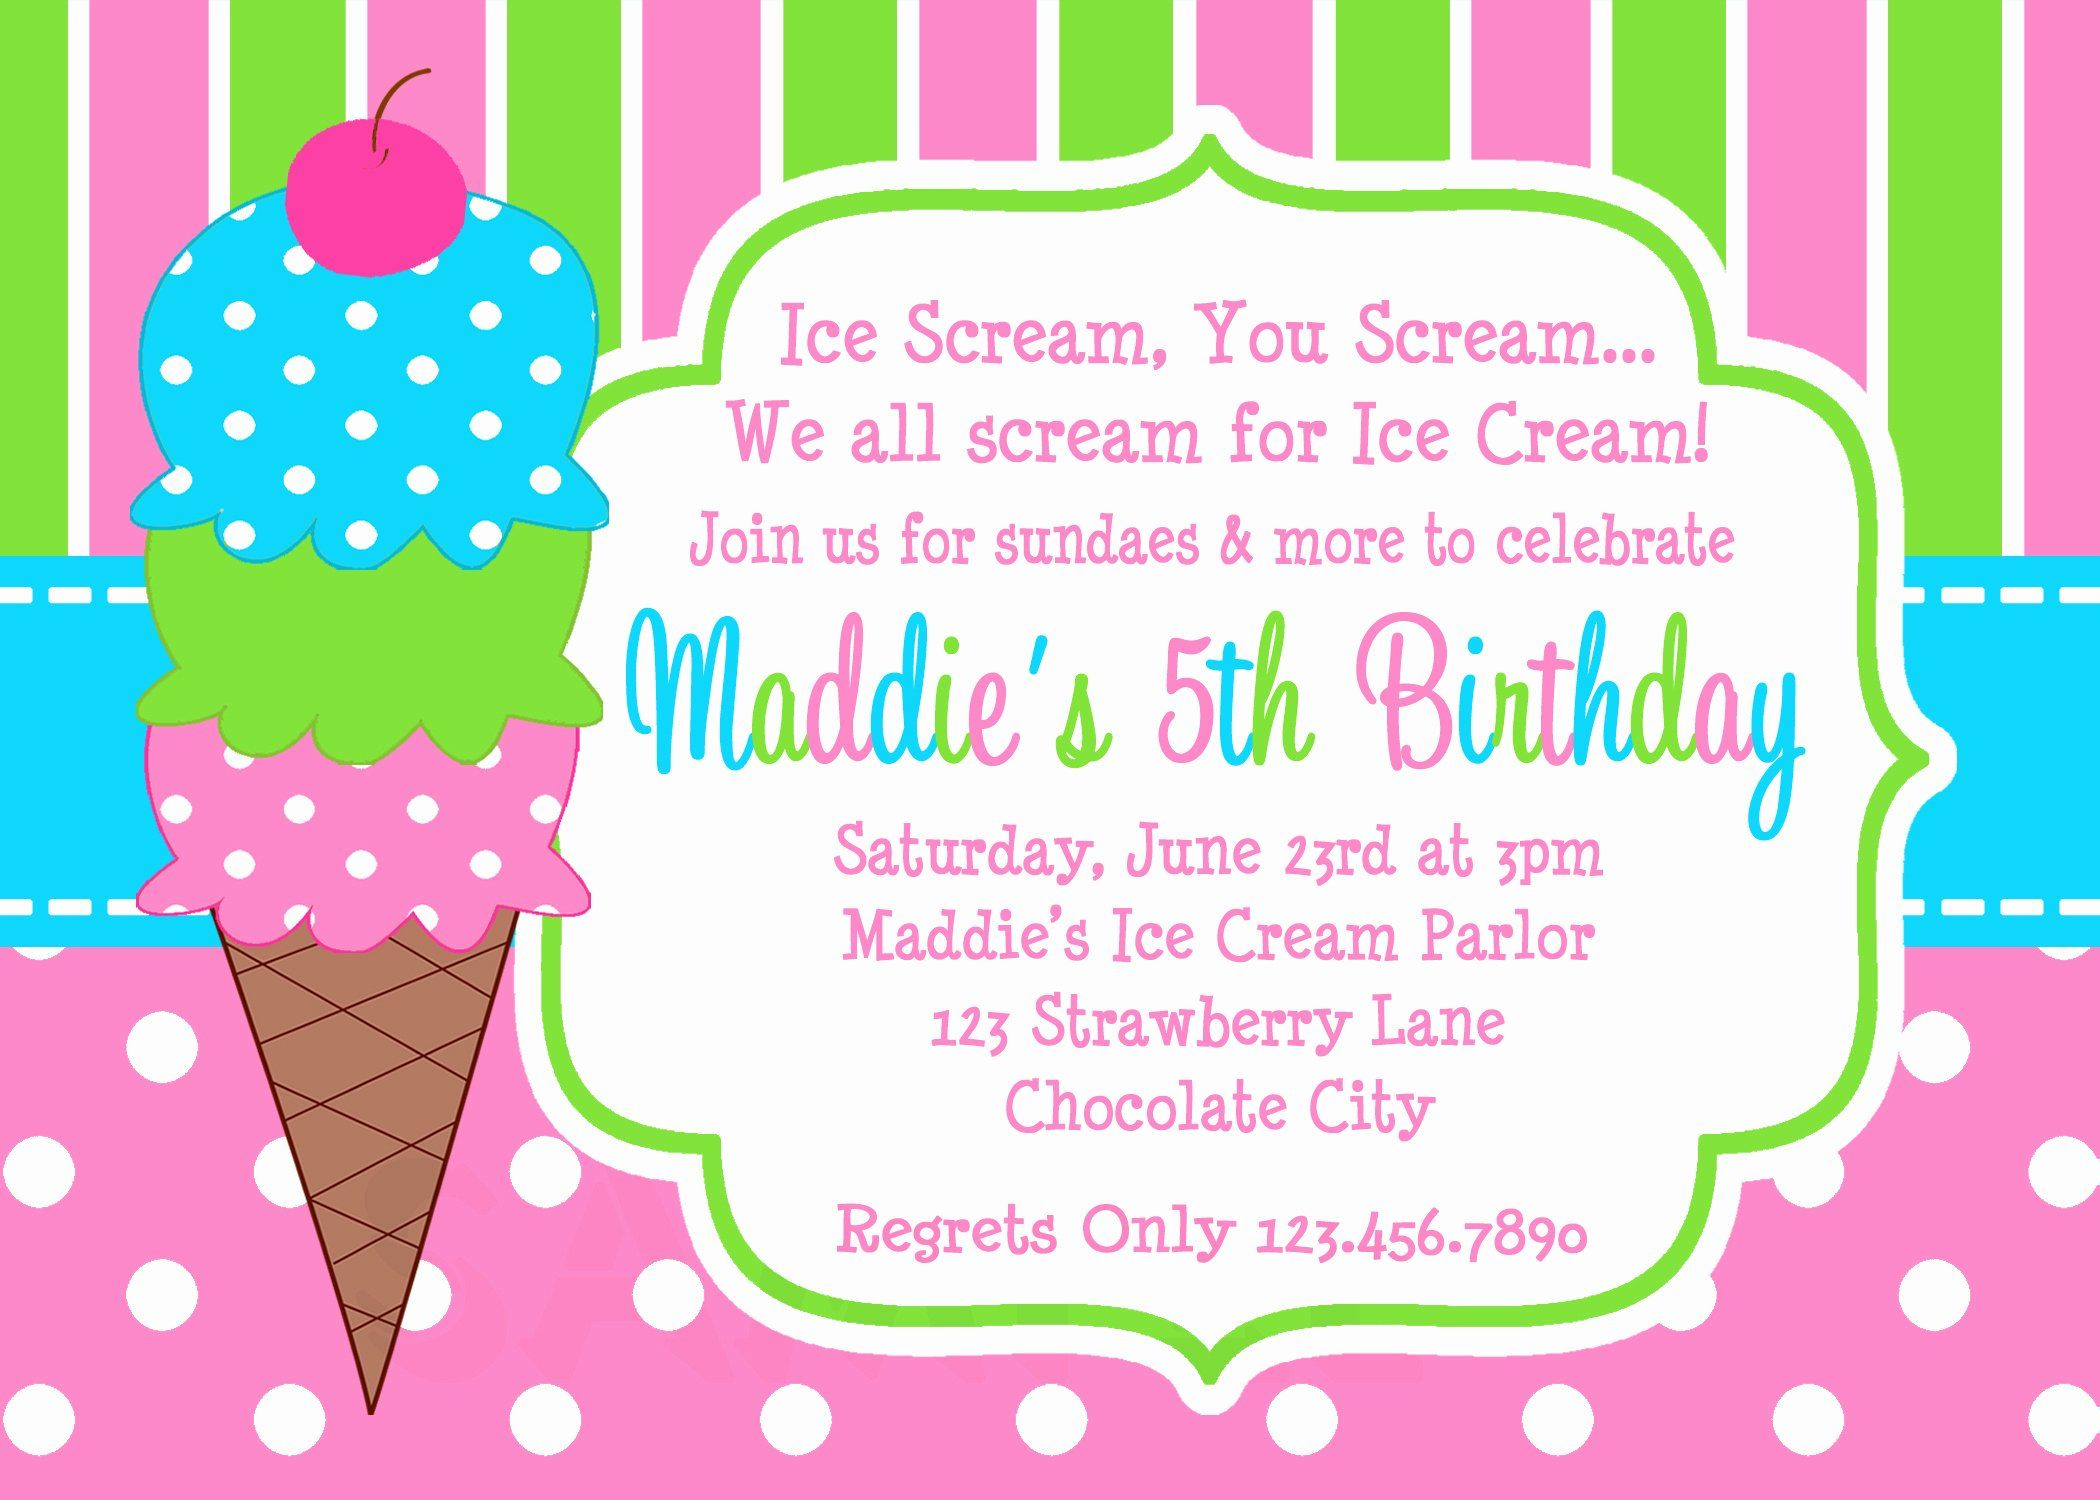 Ice Cream Birthday Invitations Elegant Printable Birth Printable Birthday Invitations Birthday Party Invitations Printable Ice Cream Birthday Party Invitations